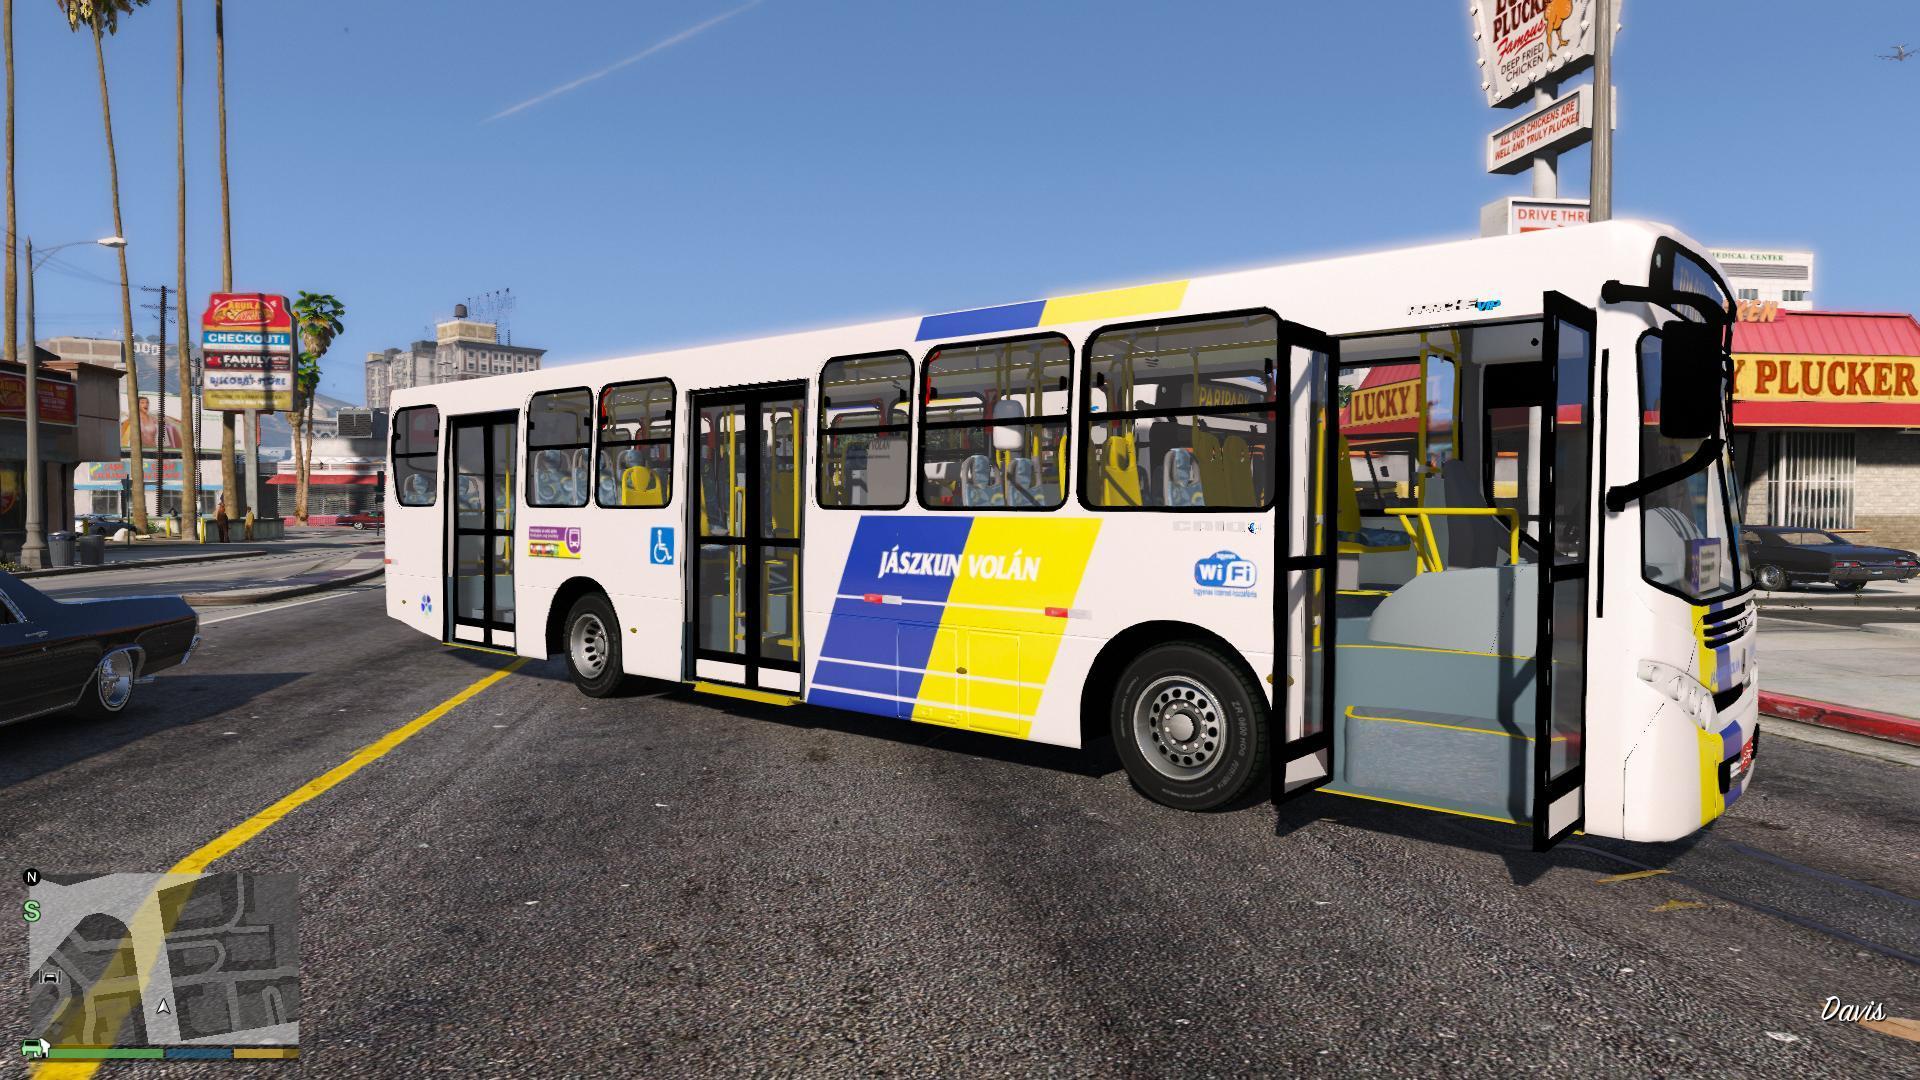 Hungarian Bus Skin - GTA5-Mods.com